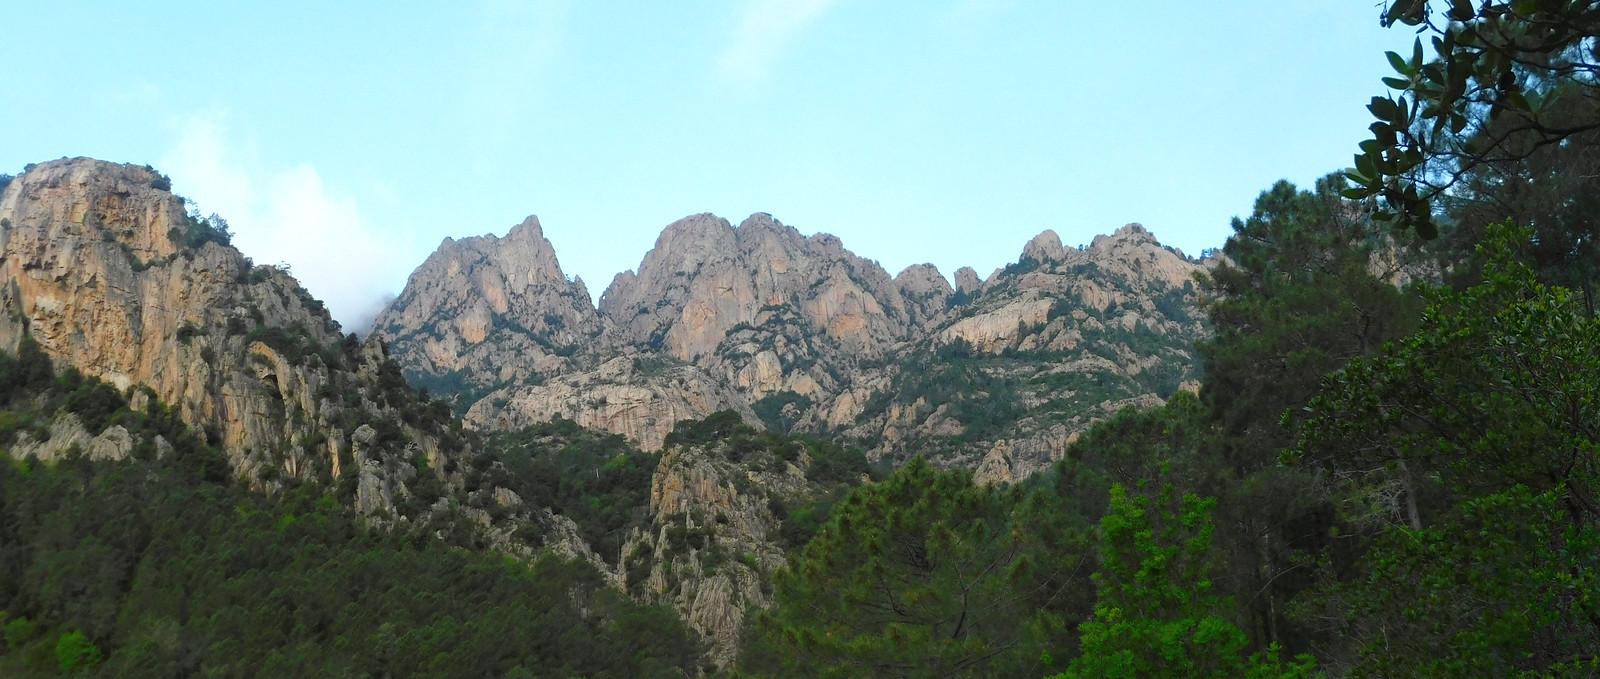 Sur le chemin du Carciara amont (HR22) : panoramique Pta di a Chiave - Pta Velacu - Calanca Murata - Aracale (photo Olivier Hespel)